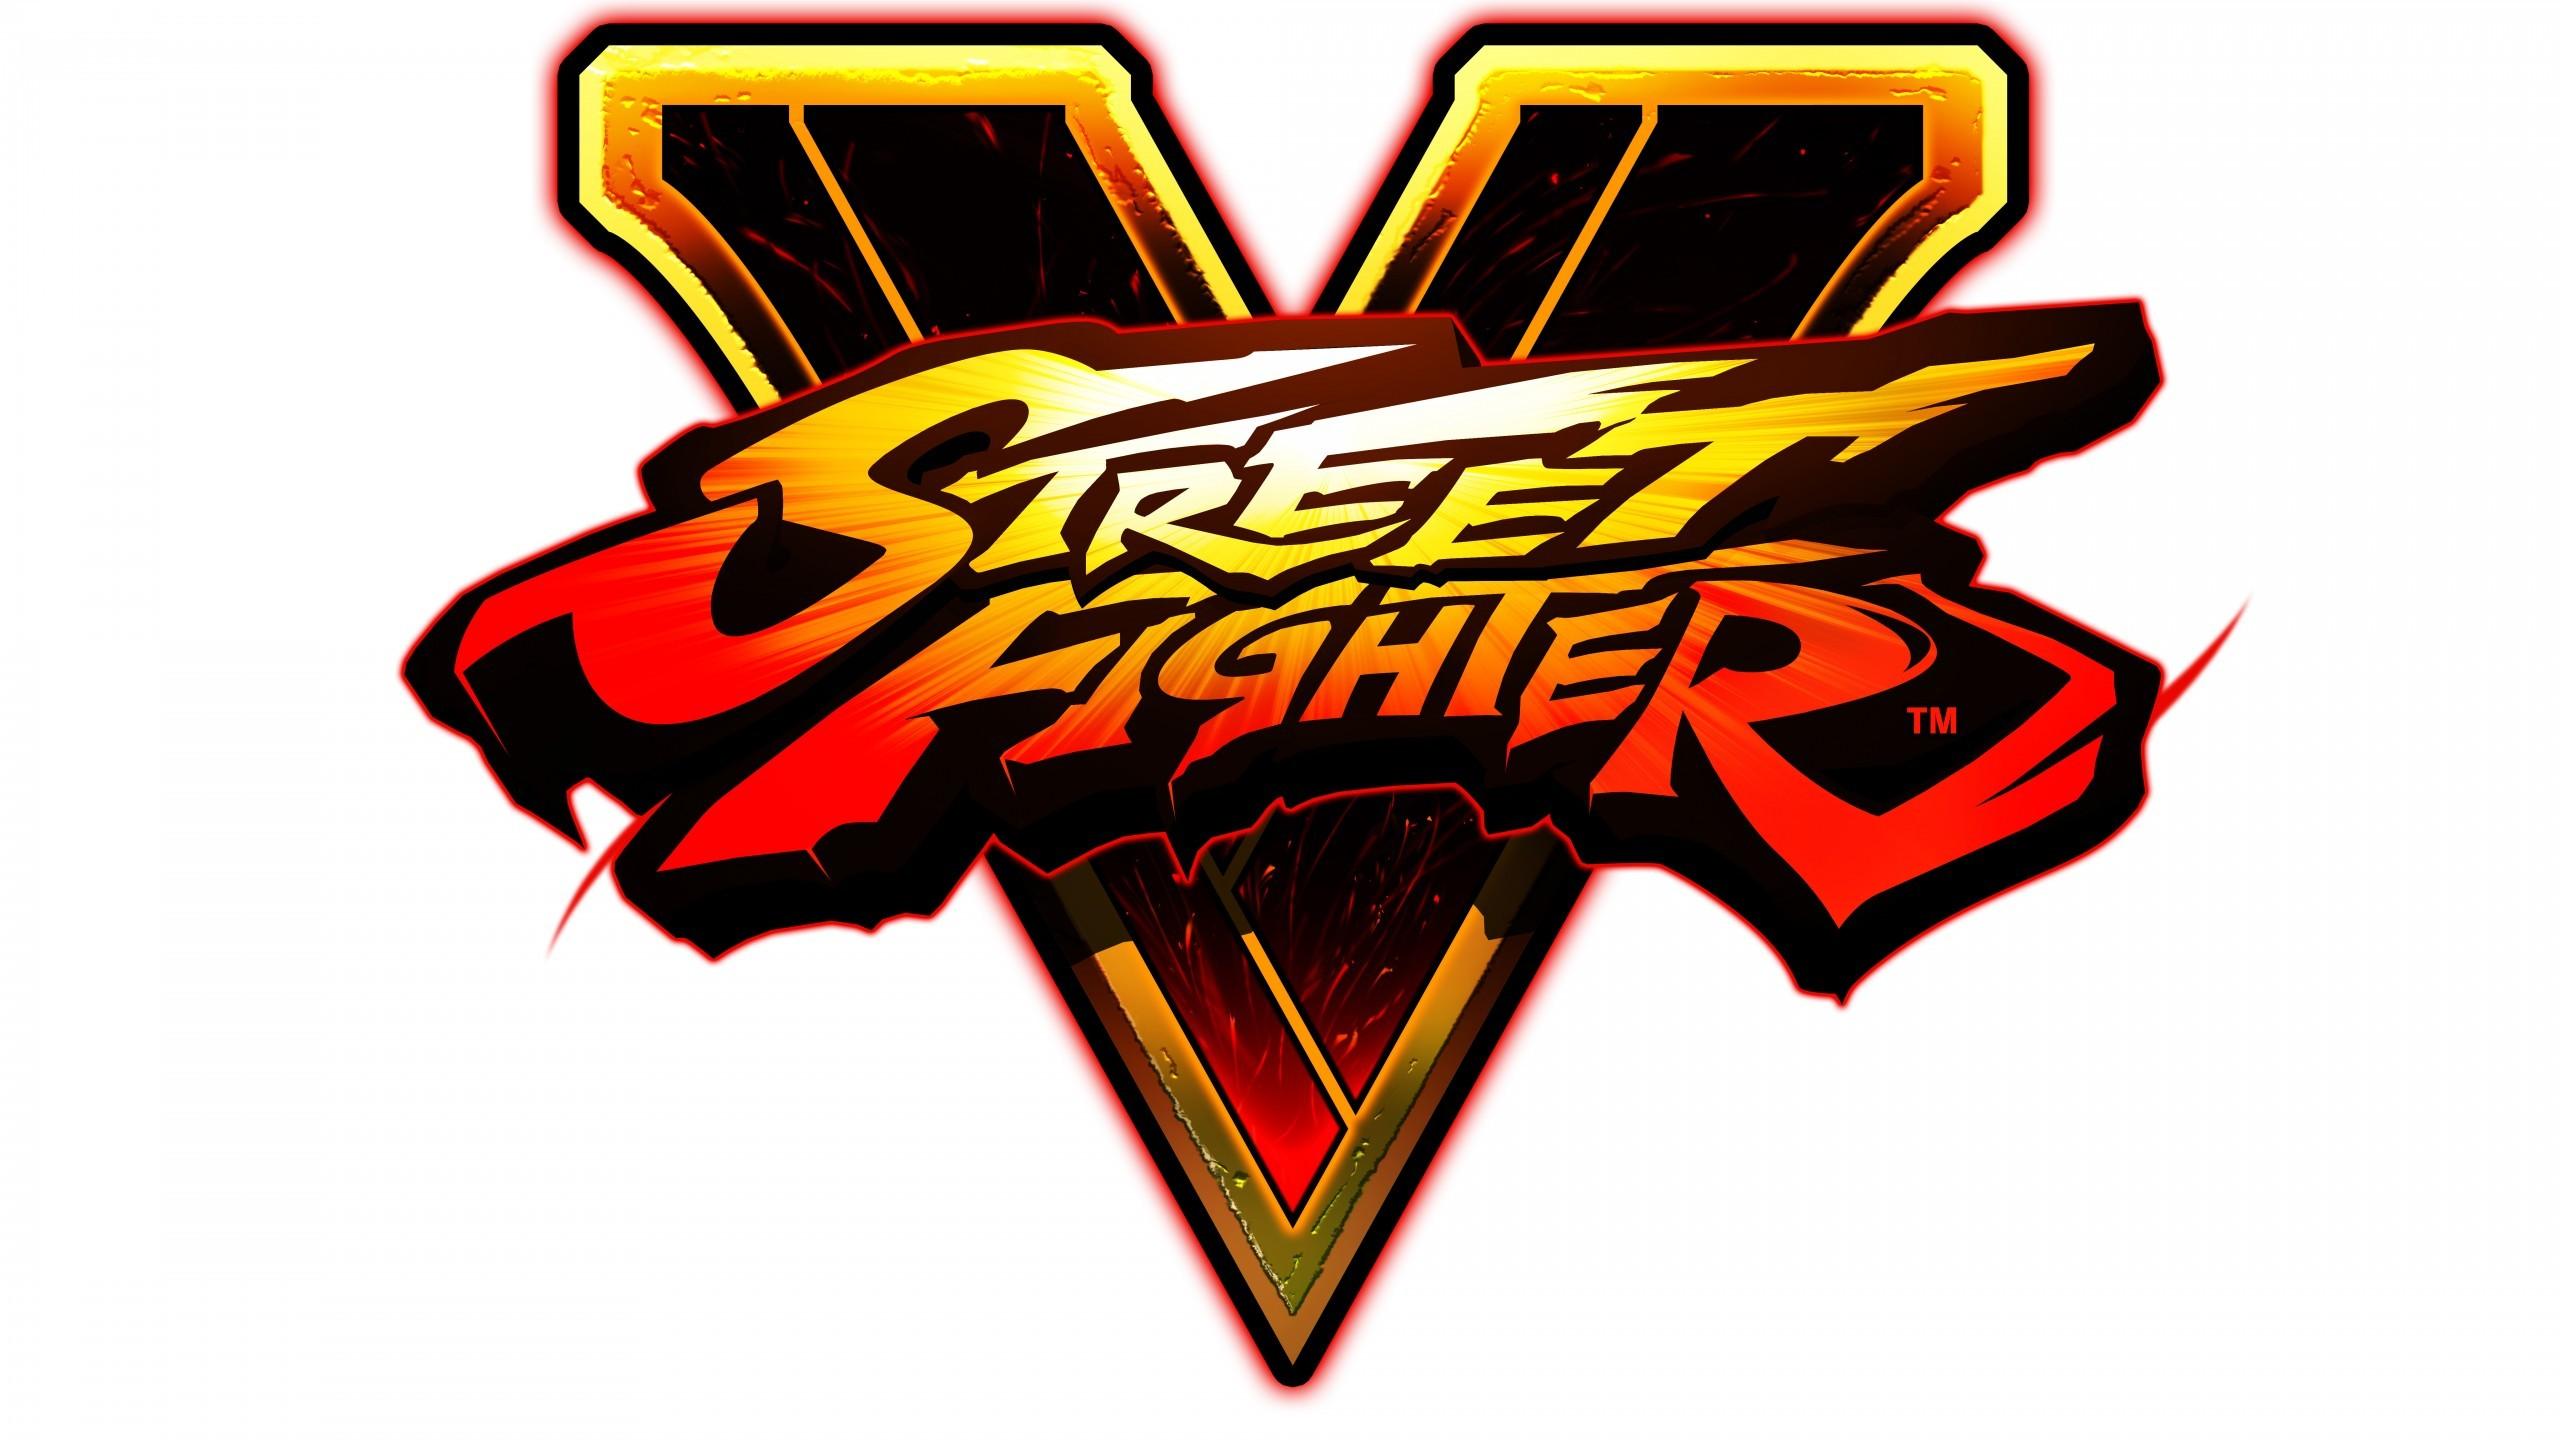 Games / Street Fighter V Wallpaper